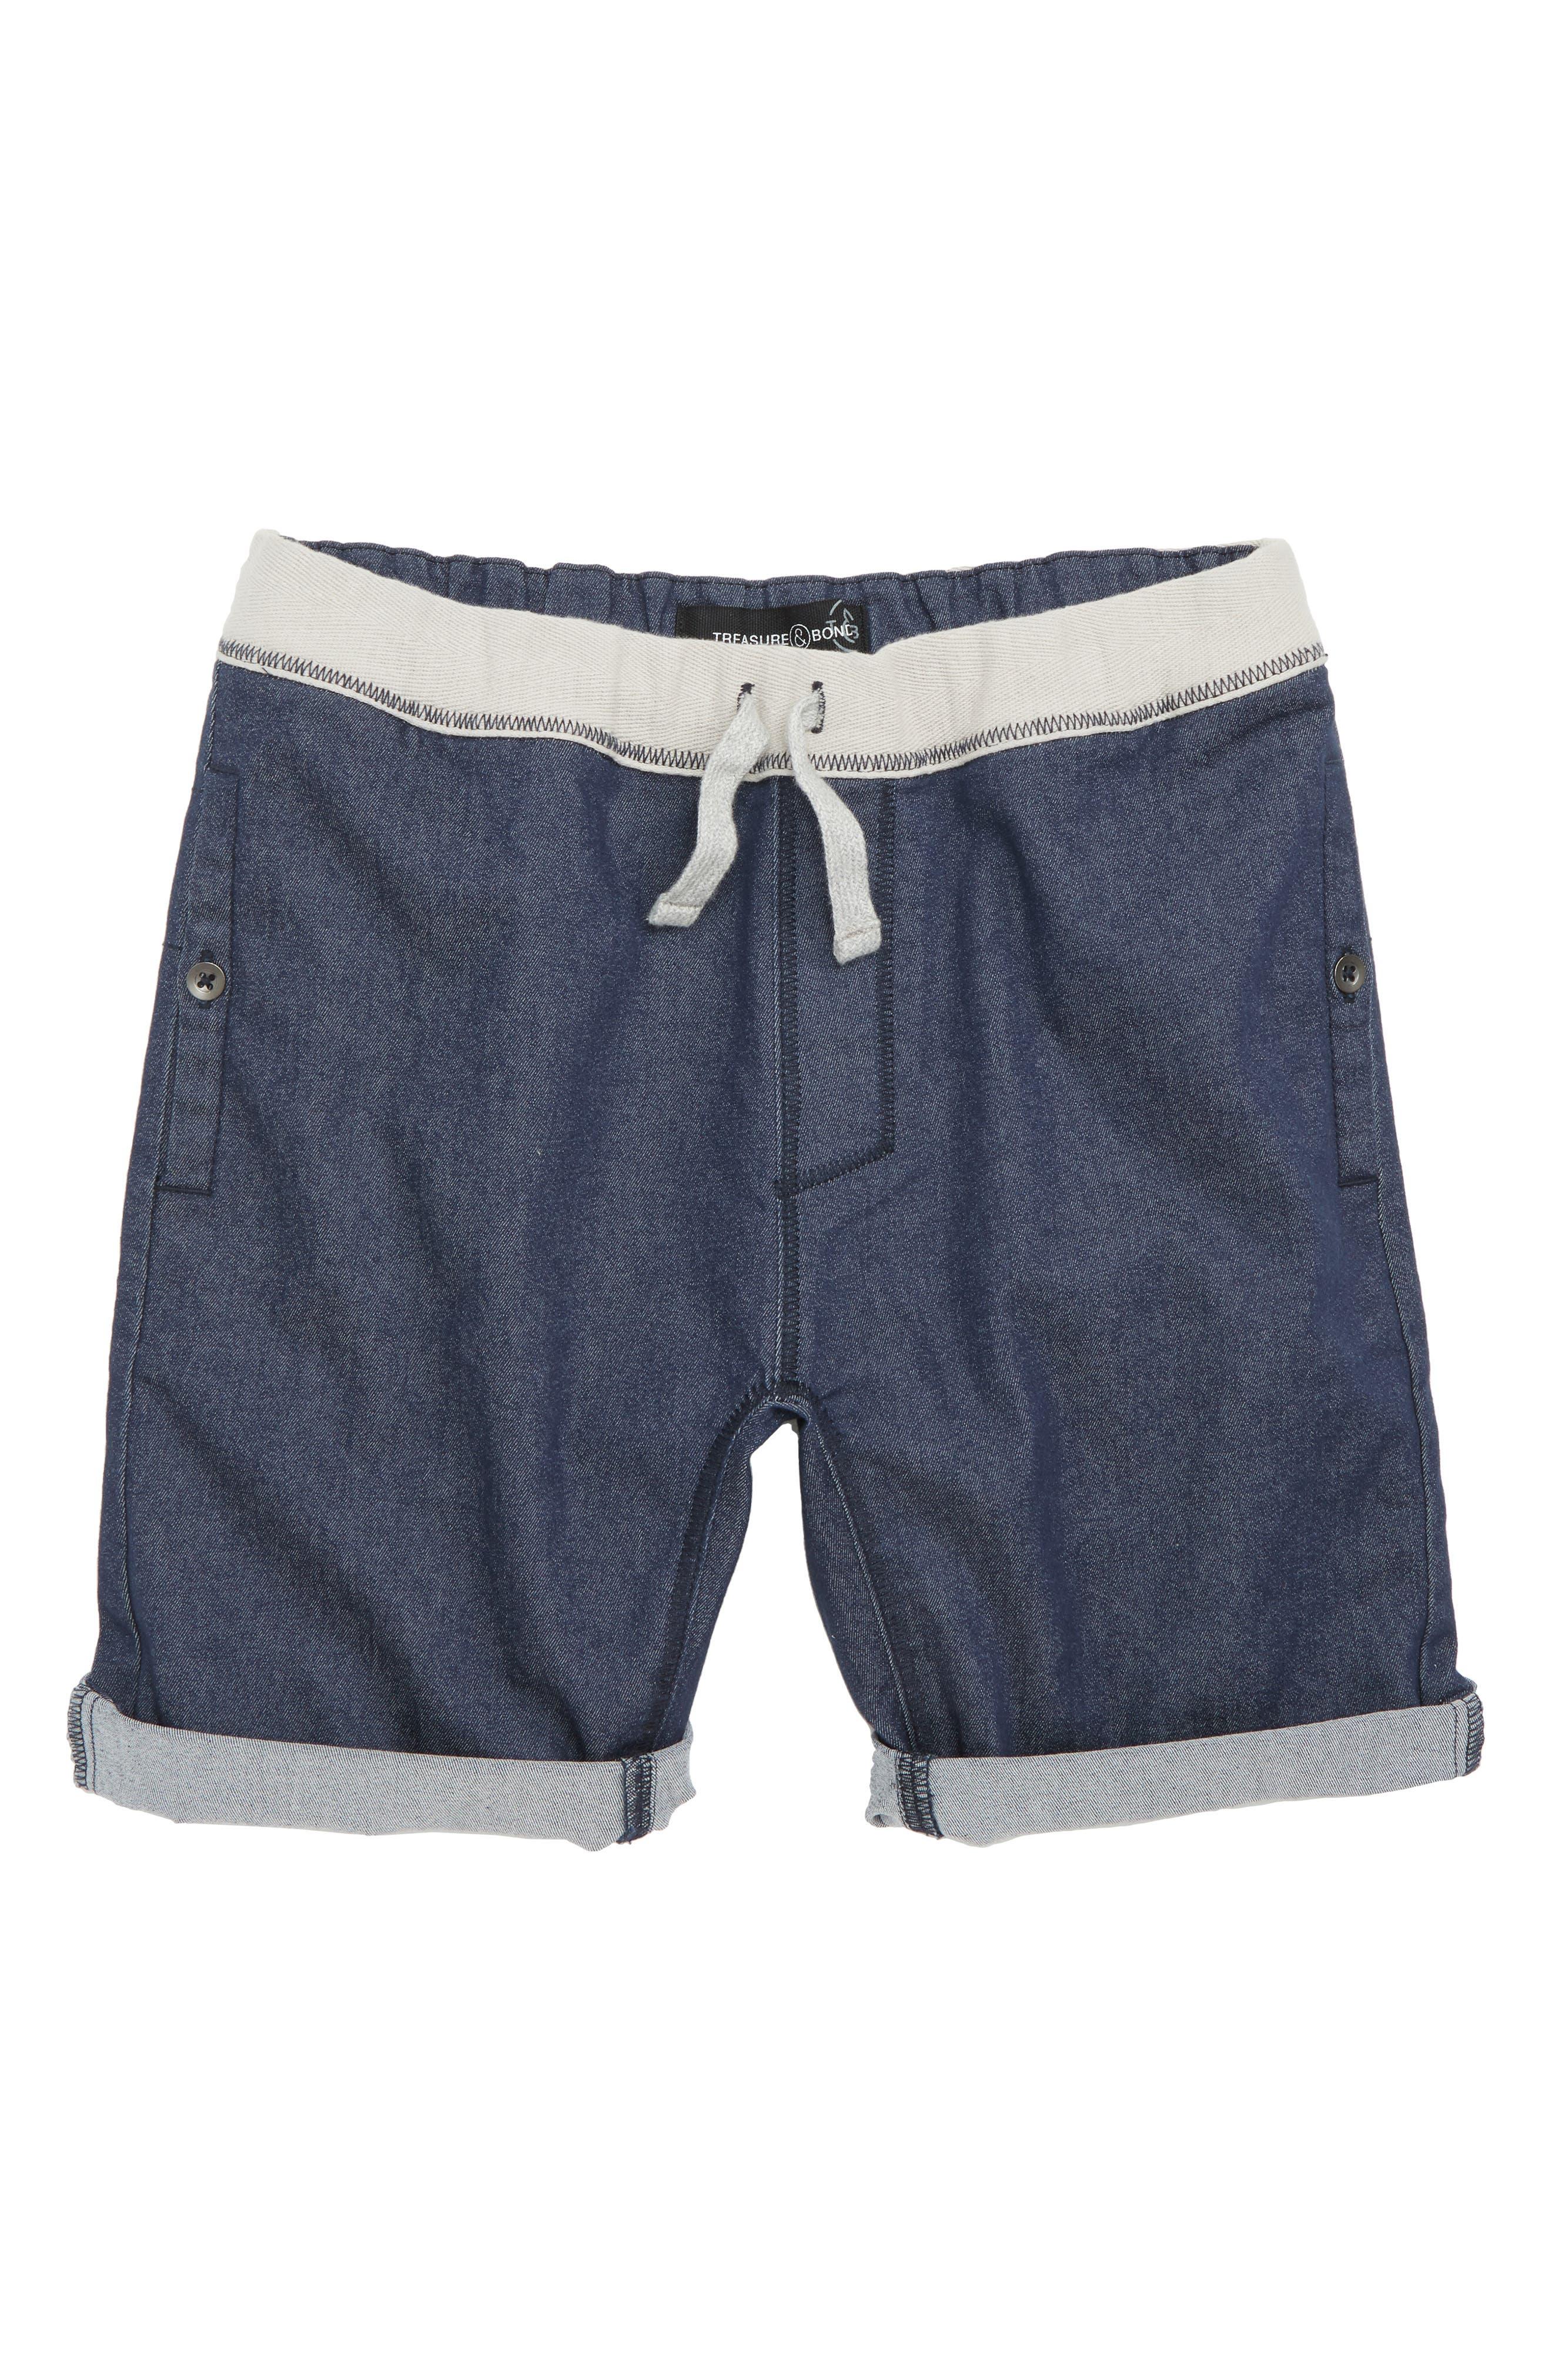 Twill Shorts,                             Main thumbnail 1, color,                             Navy Indigo